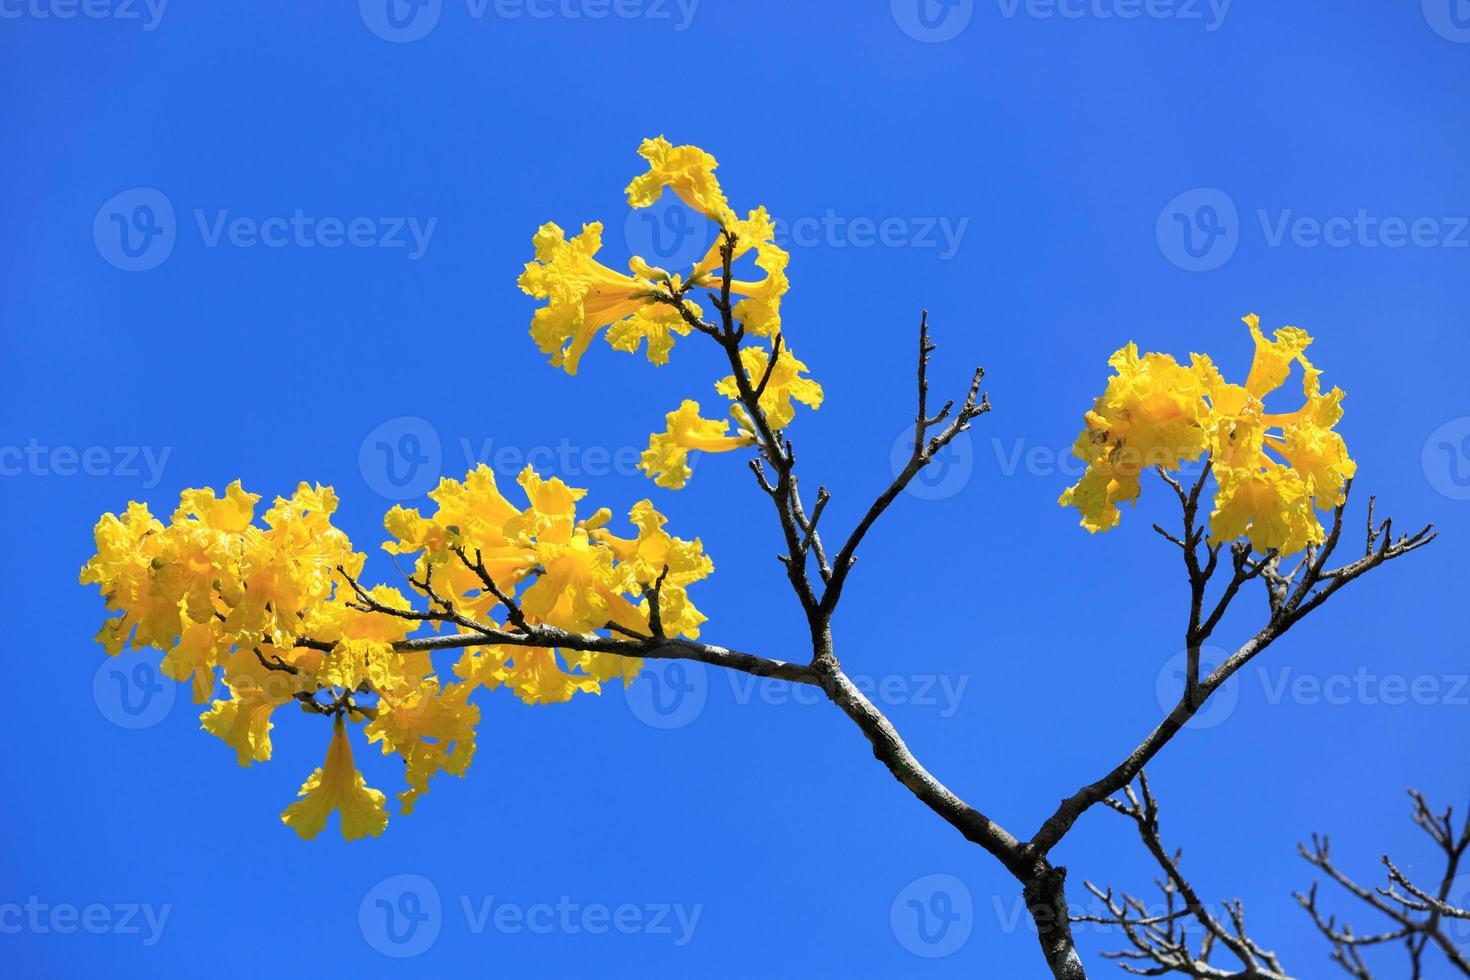 gelber Brunch am blauen Himmel foto